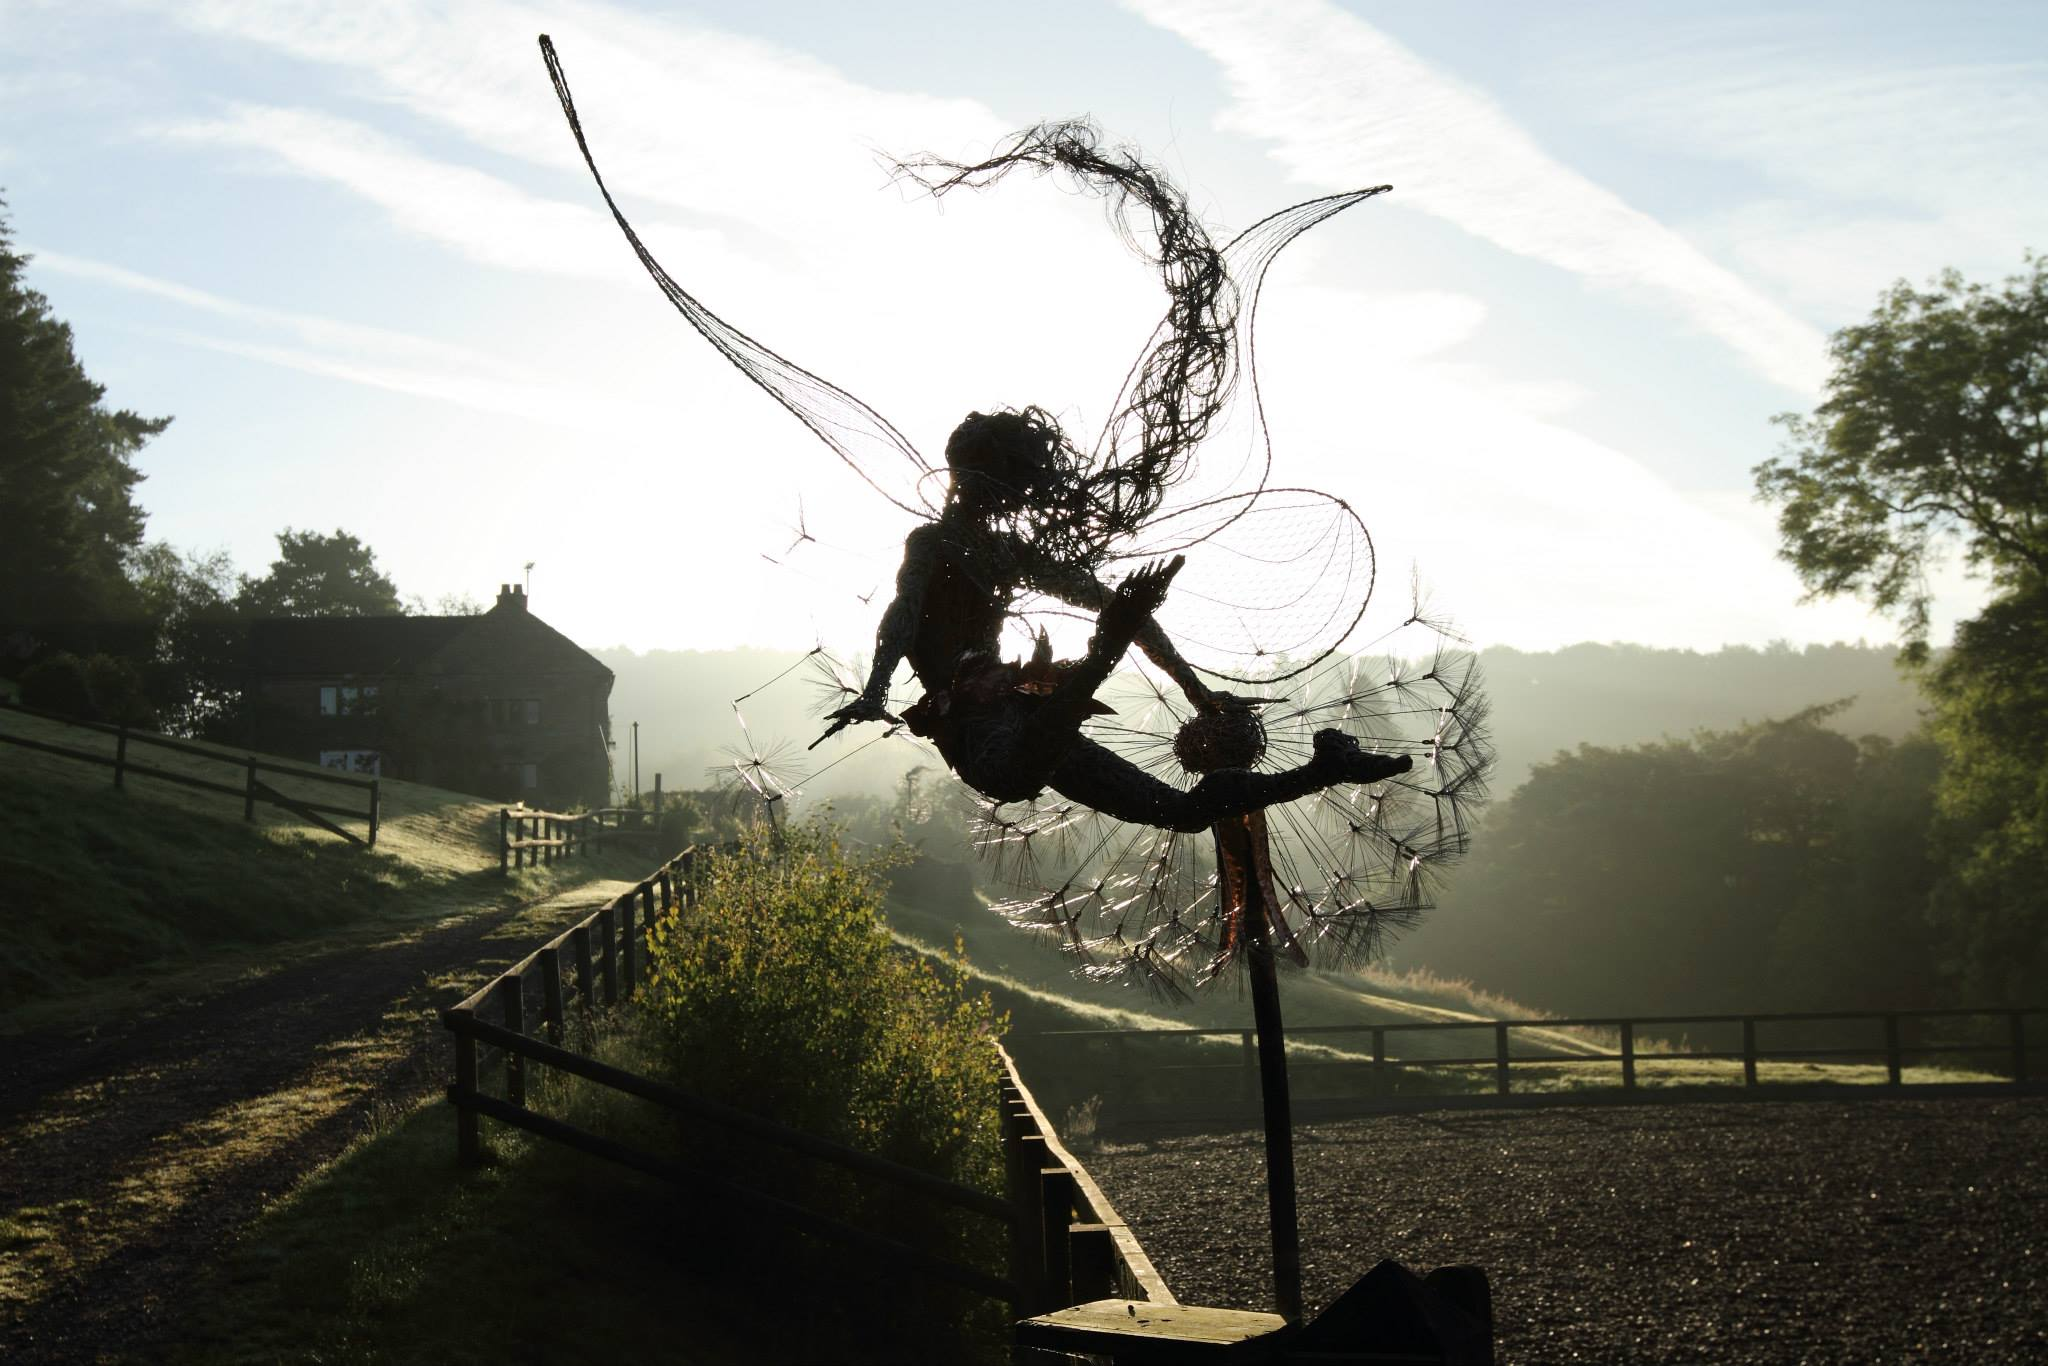 esculturas-fantasticas-de-robin-wight-07